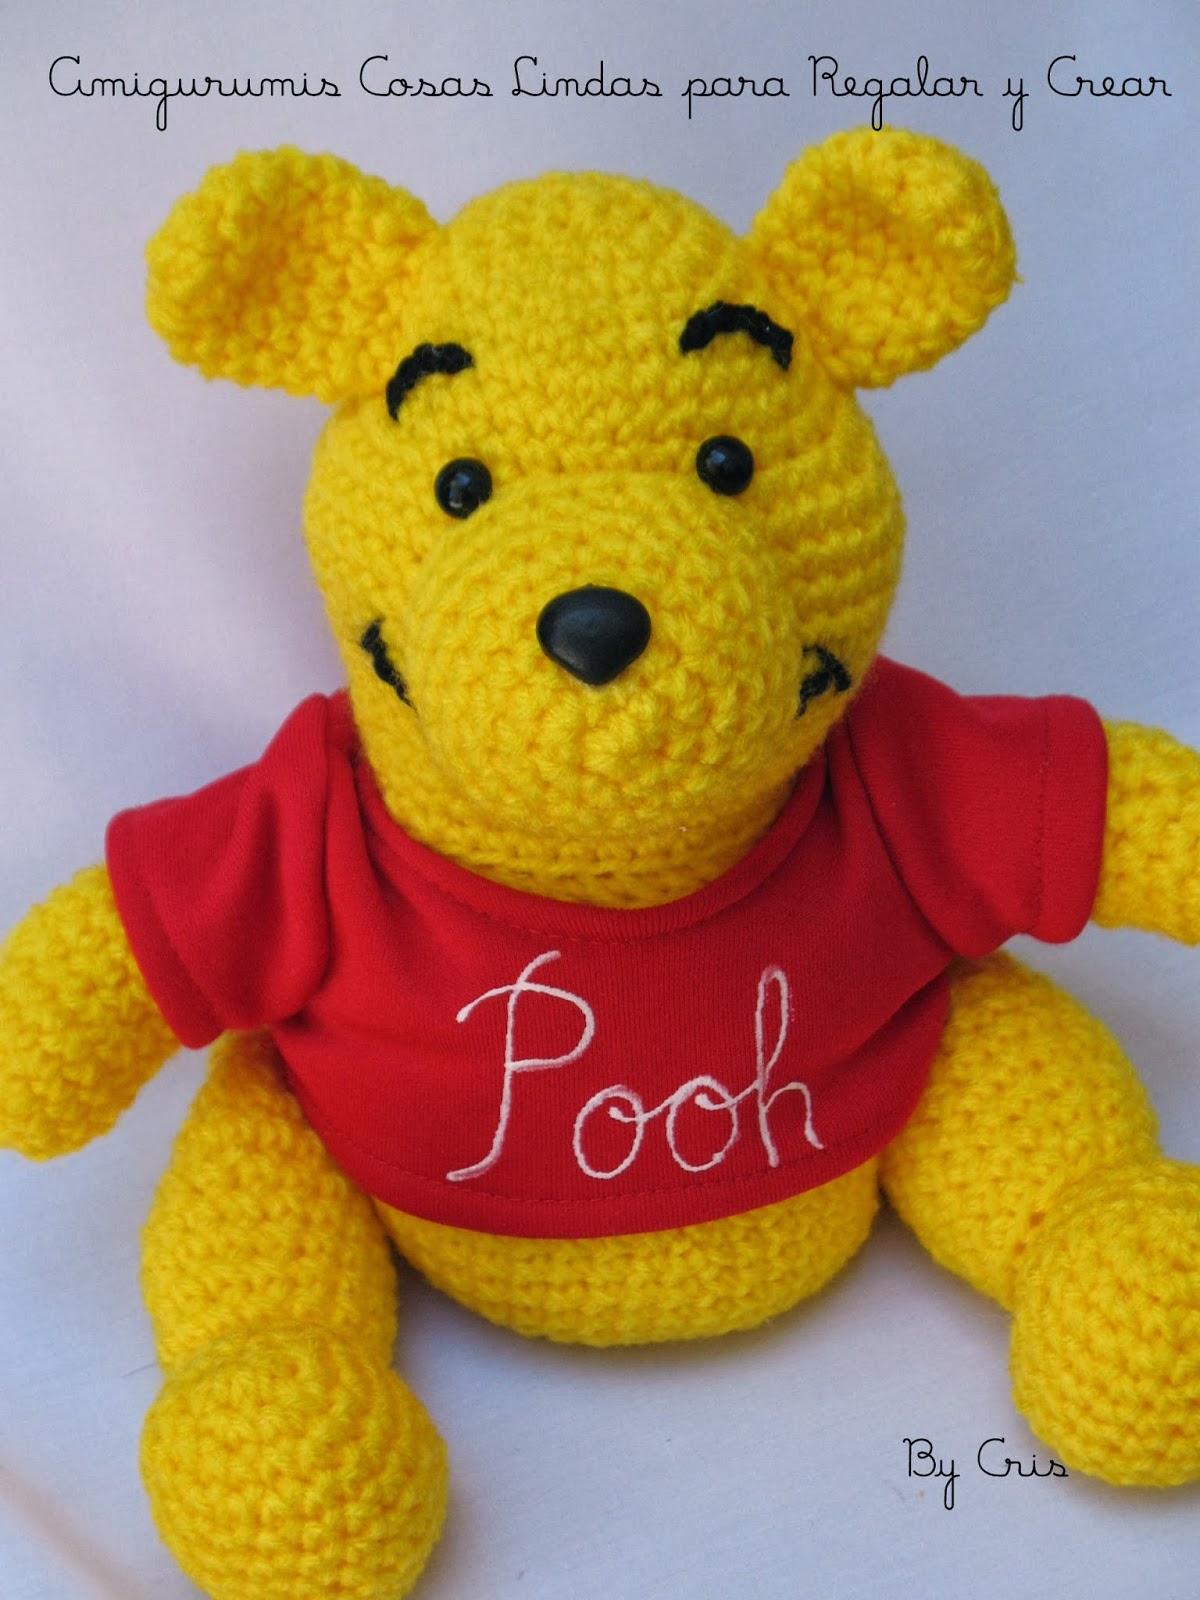 Amigurumi Winnie The Pooh : Amigurumis . Cosas Lindas: WINNIE THE POOH AMIGURUMI